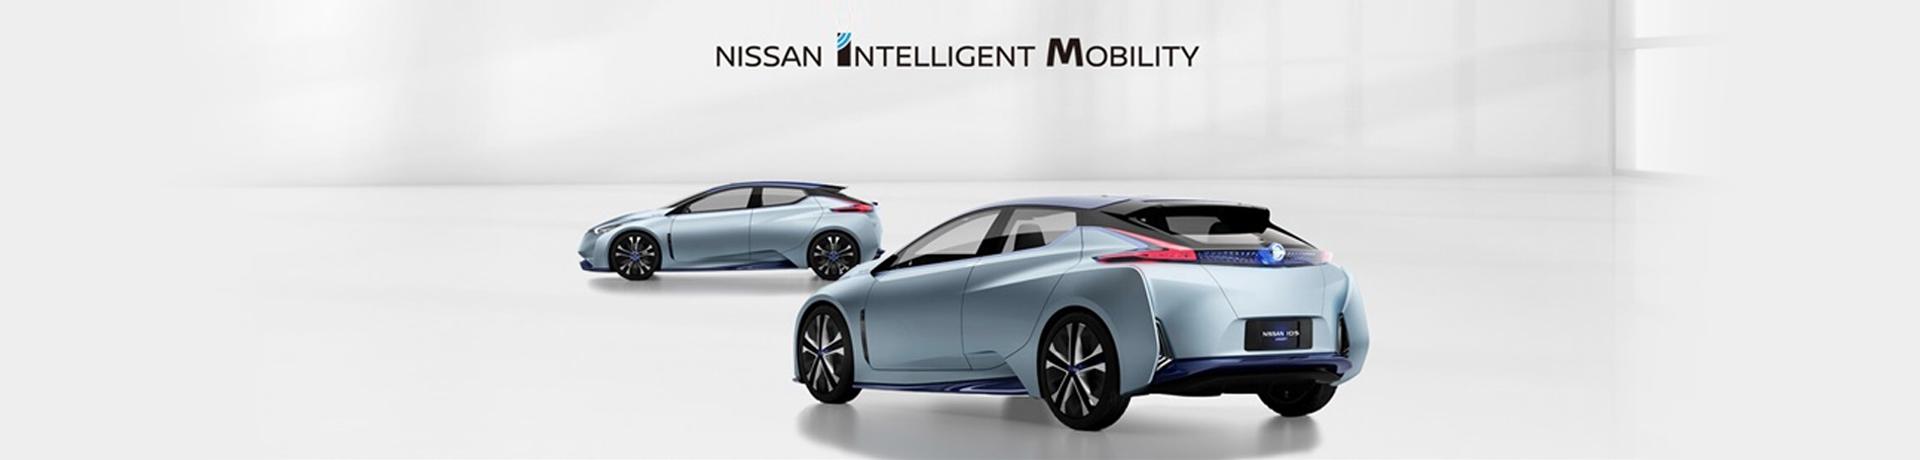 Nissan-Intelligent-Mobility